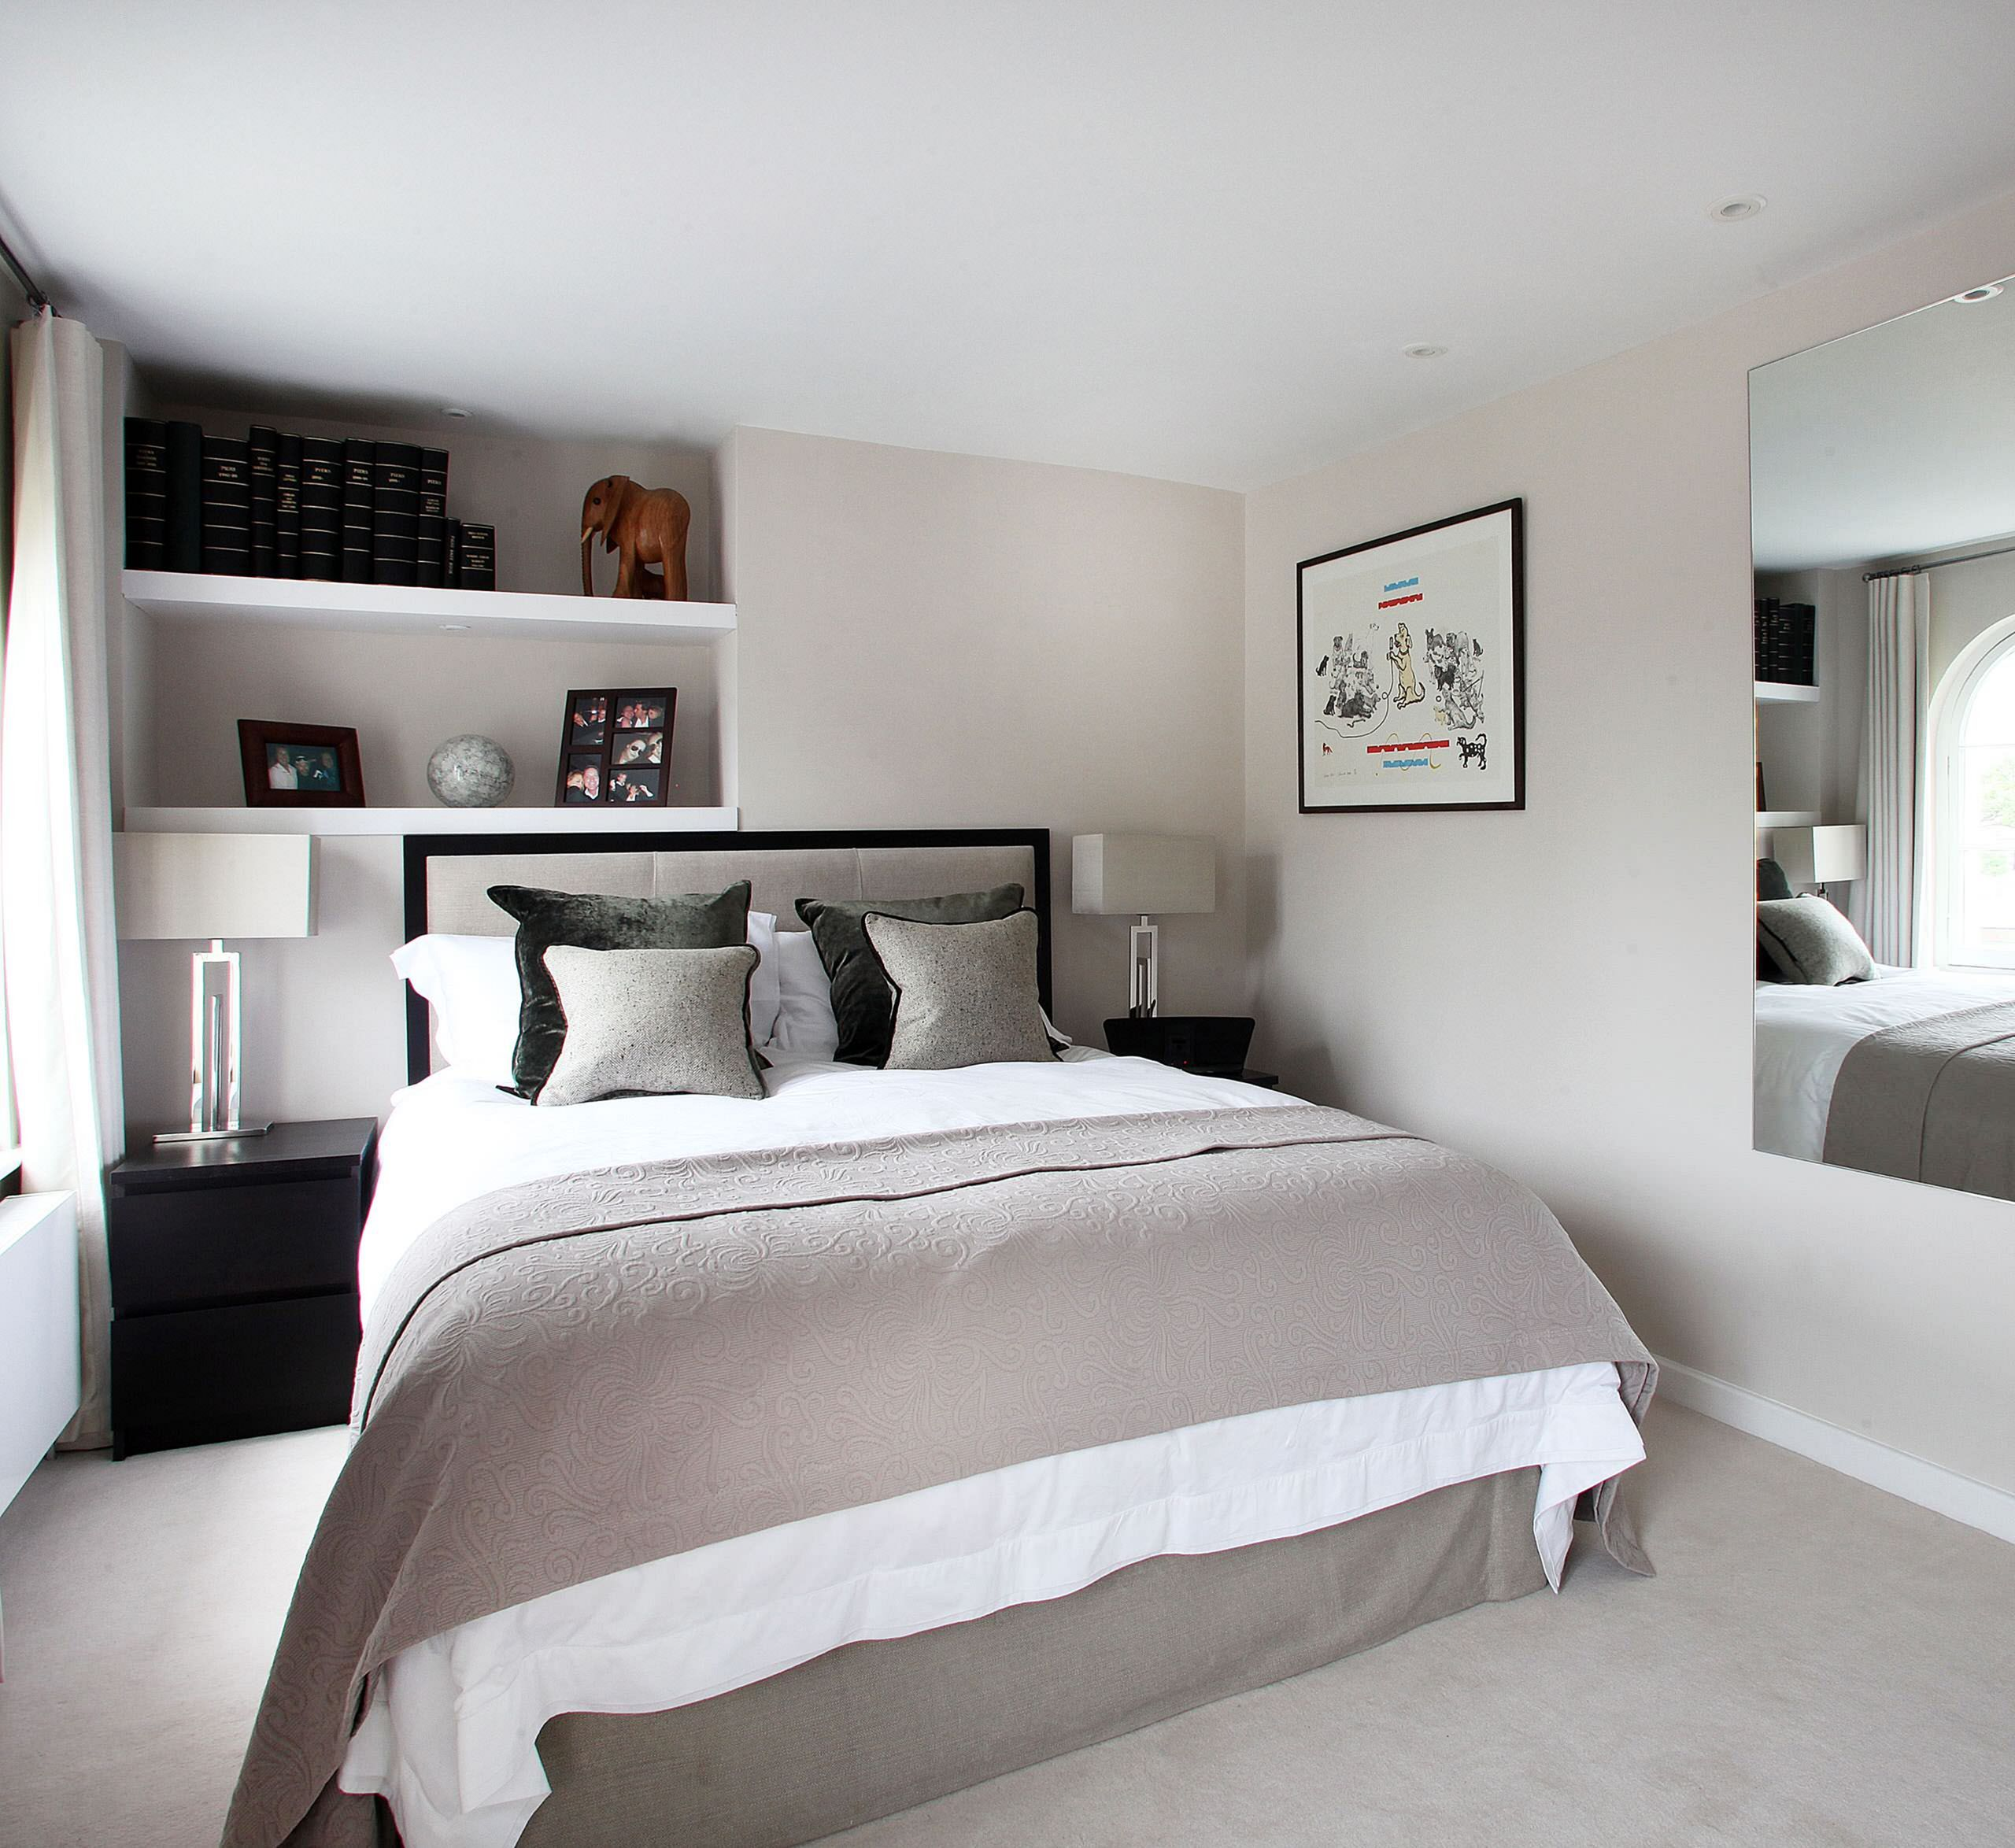 10 amazing small bedroom design ideas for deep sleep